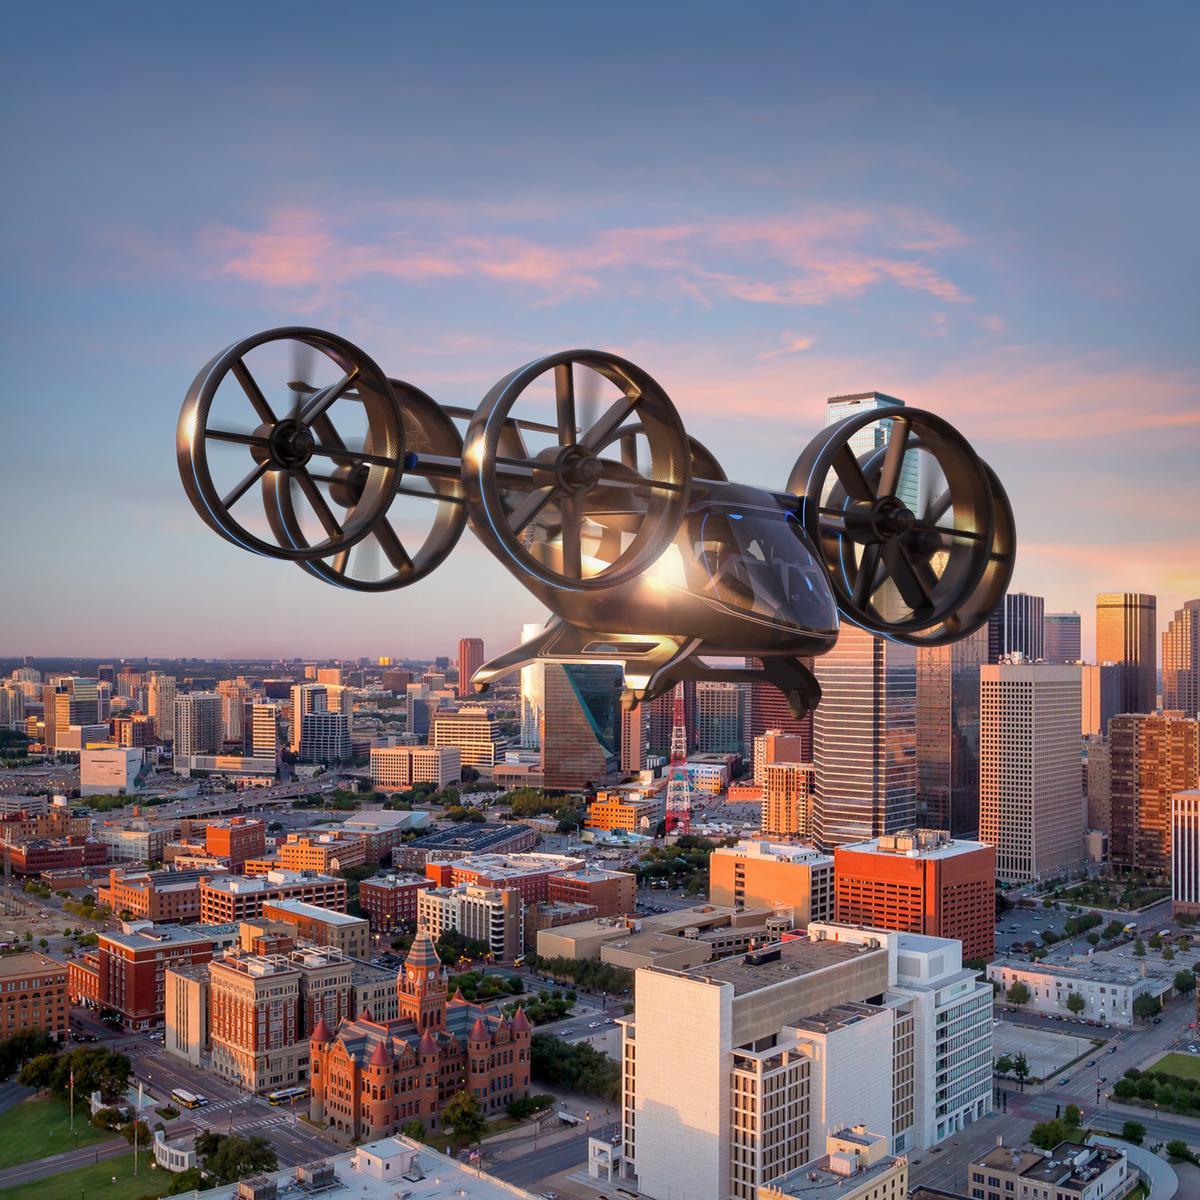 A render of Bell's Nexus flying taxi in flight